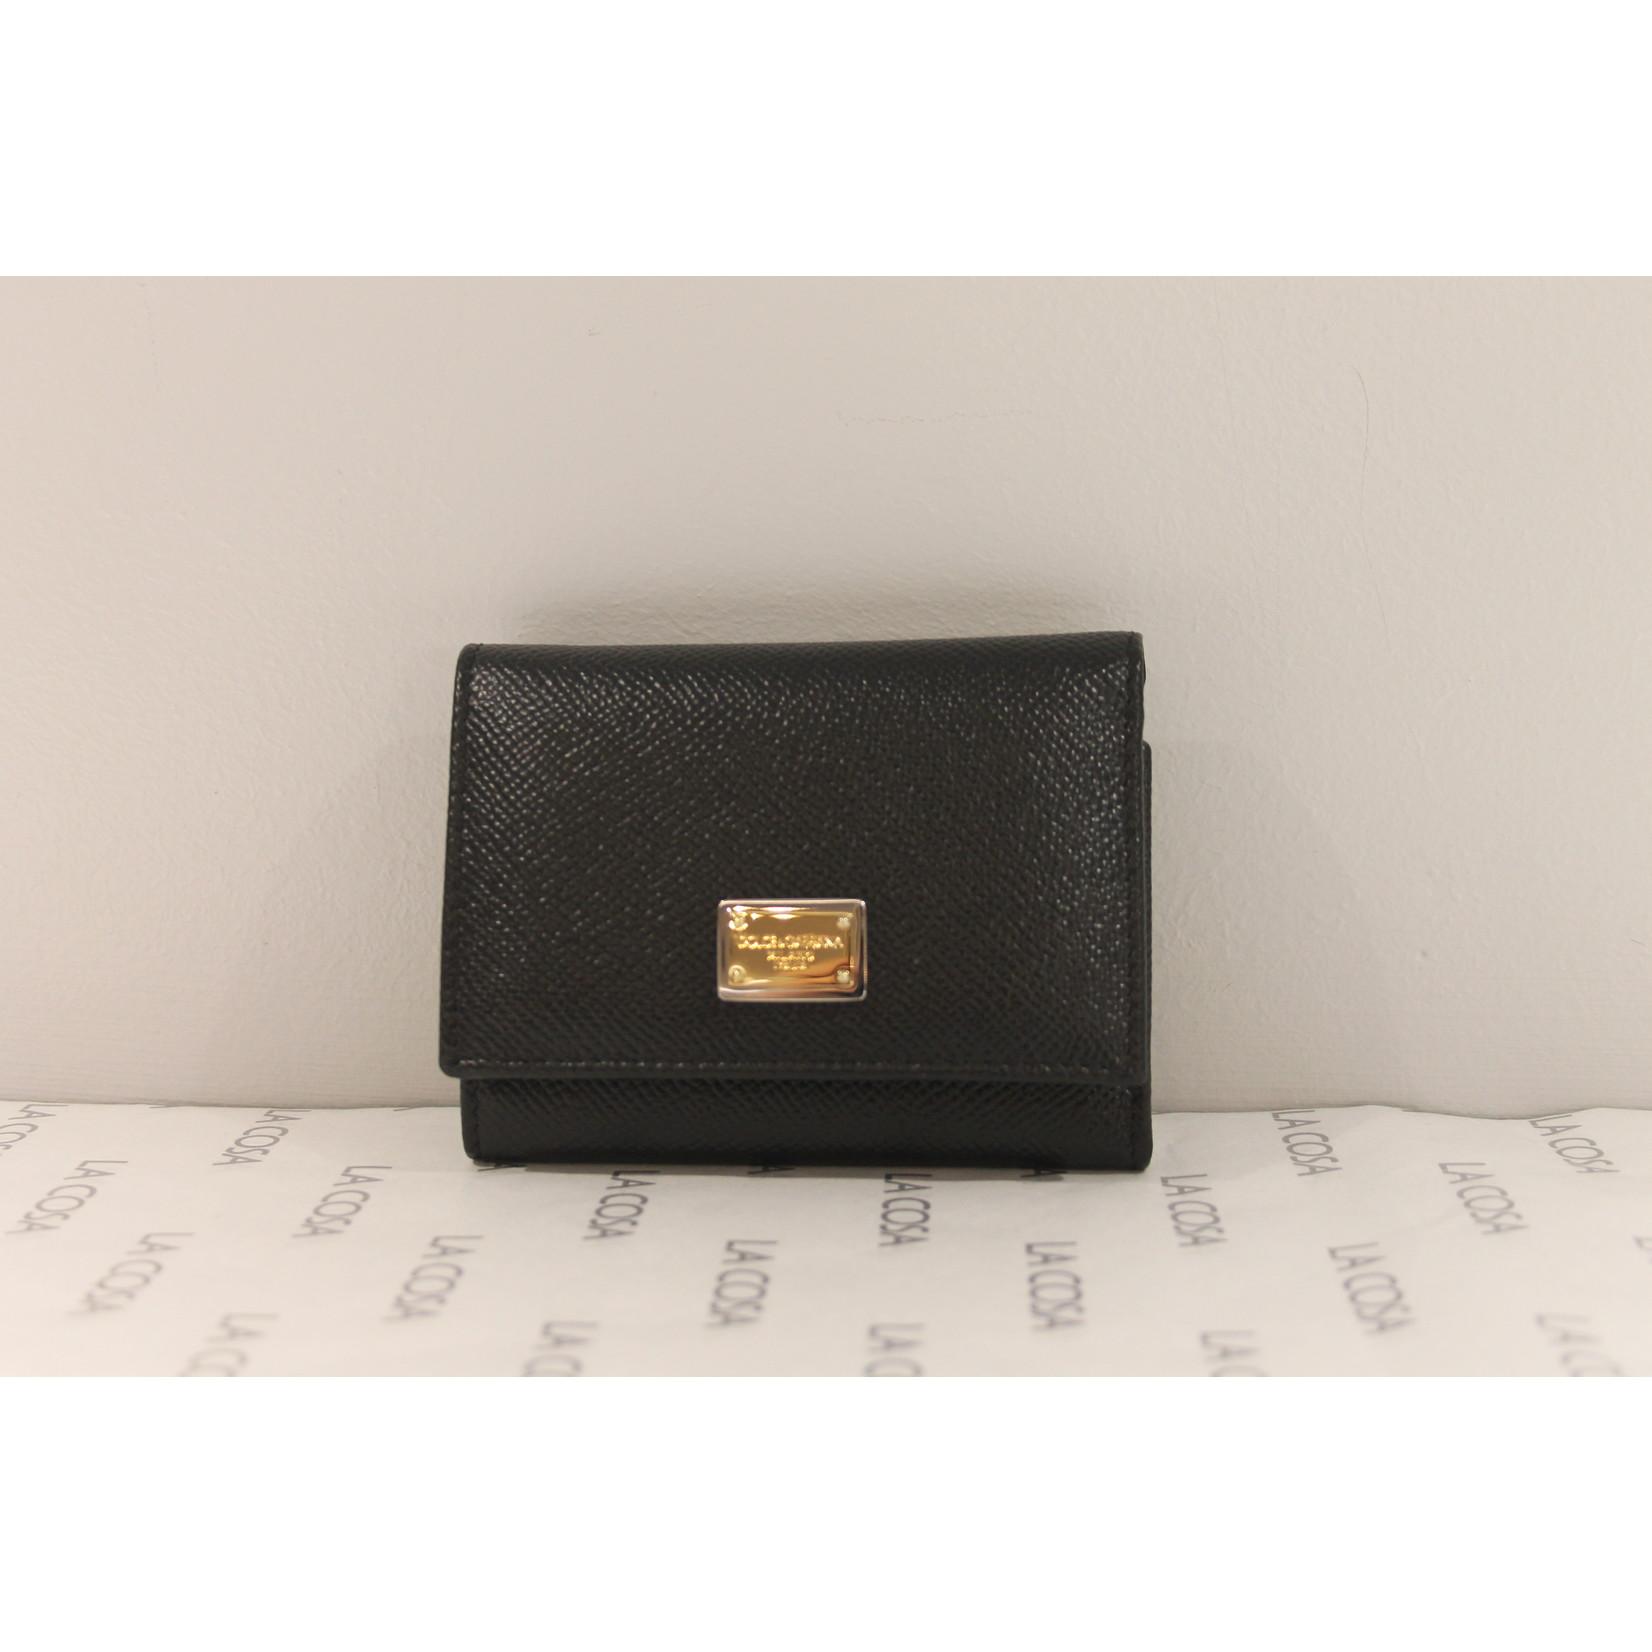 Dolce&Gabbana Tas Portefeuille 42982